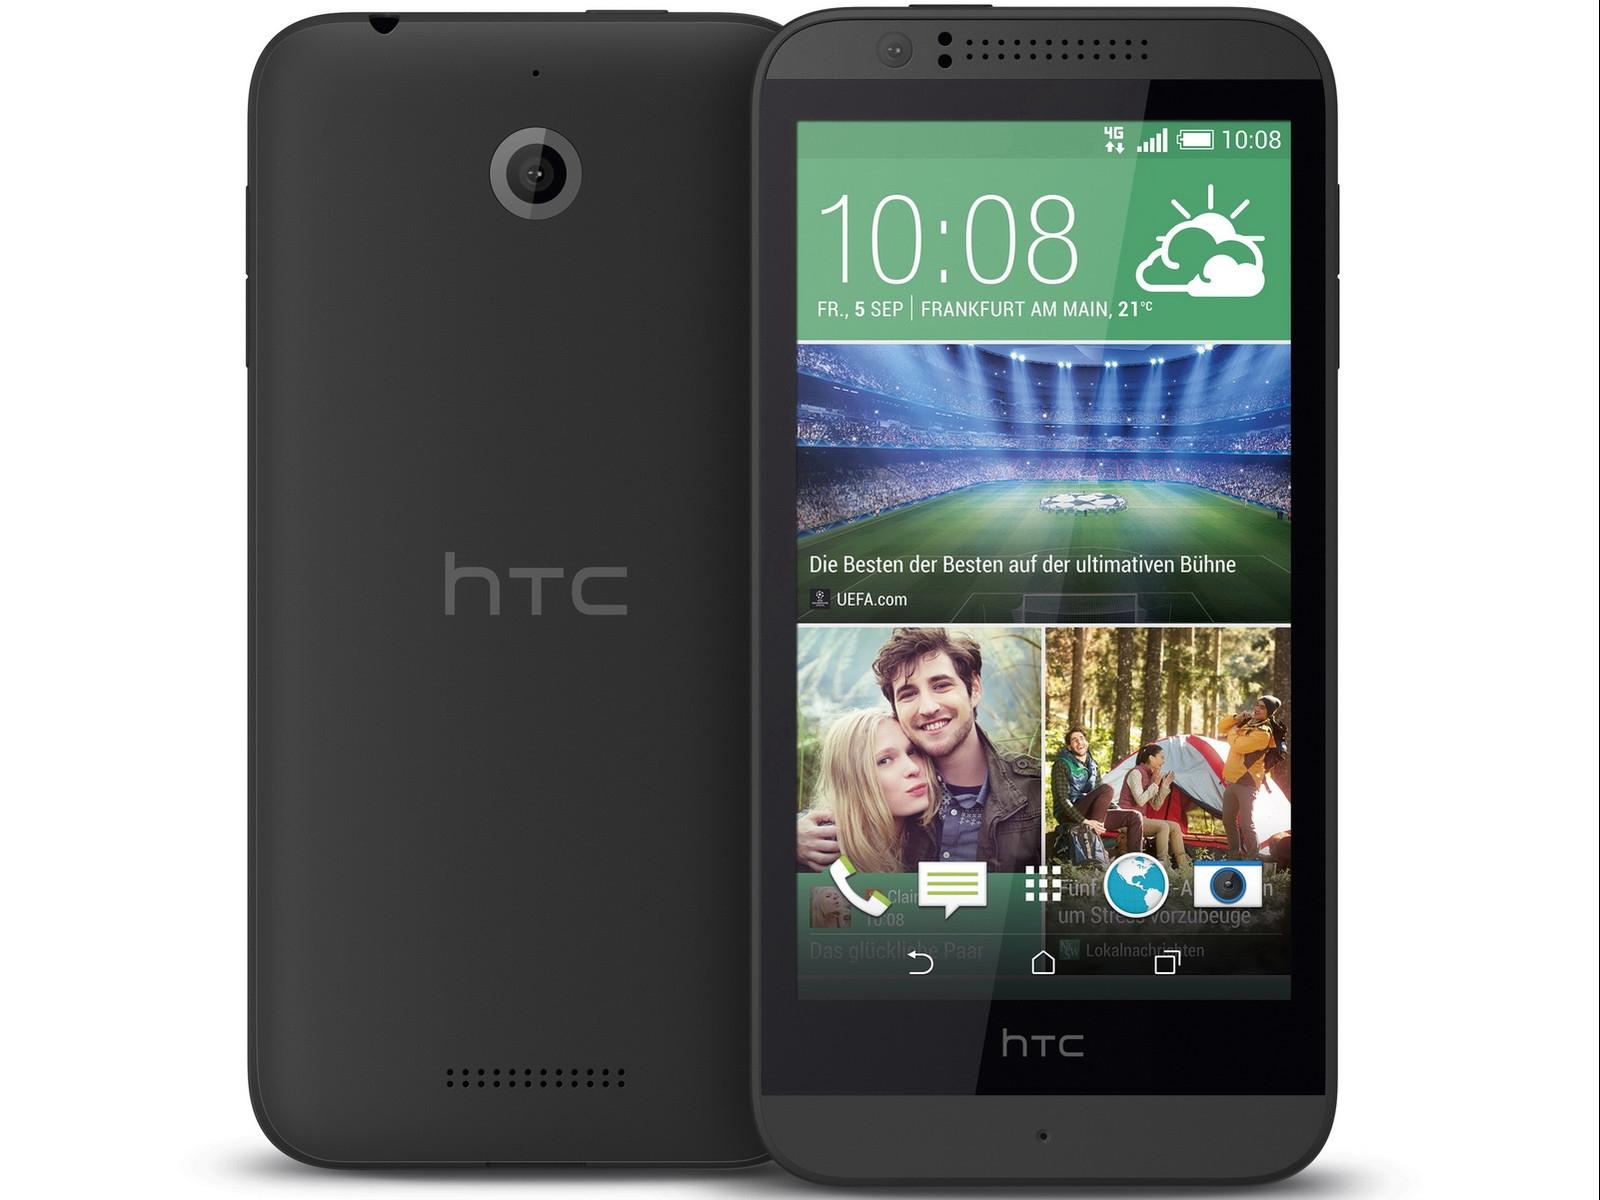 htc desire 510 smartphone review notebookcheck net reviews rh notebookcheck net HTC Android HTC Android